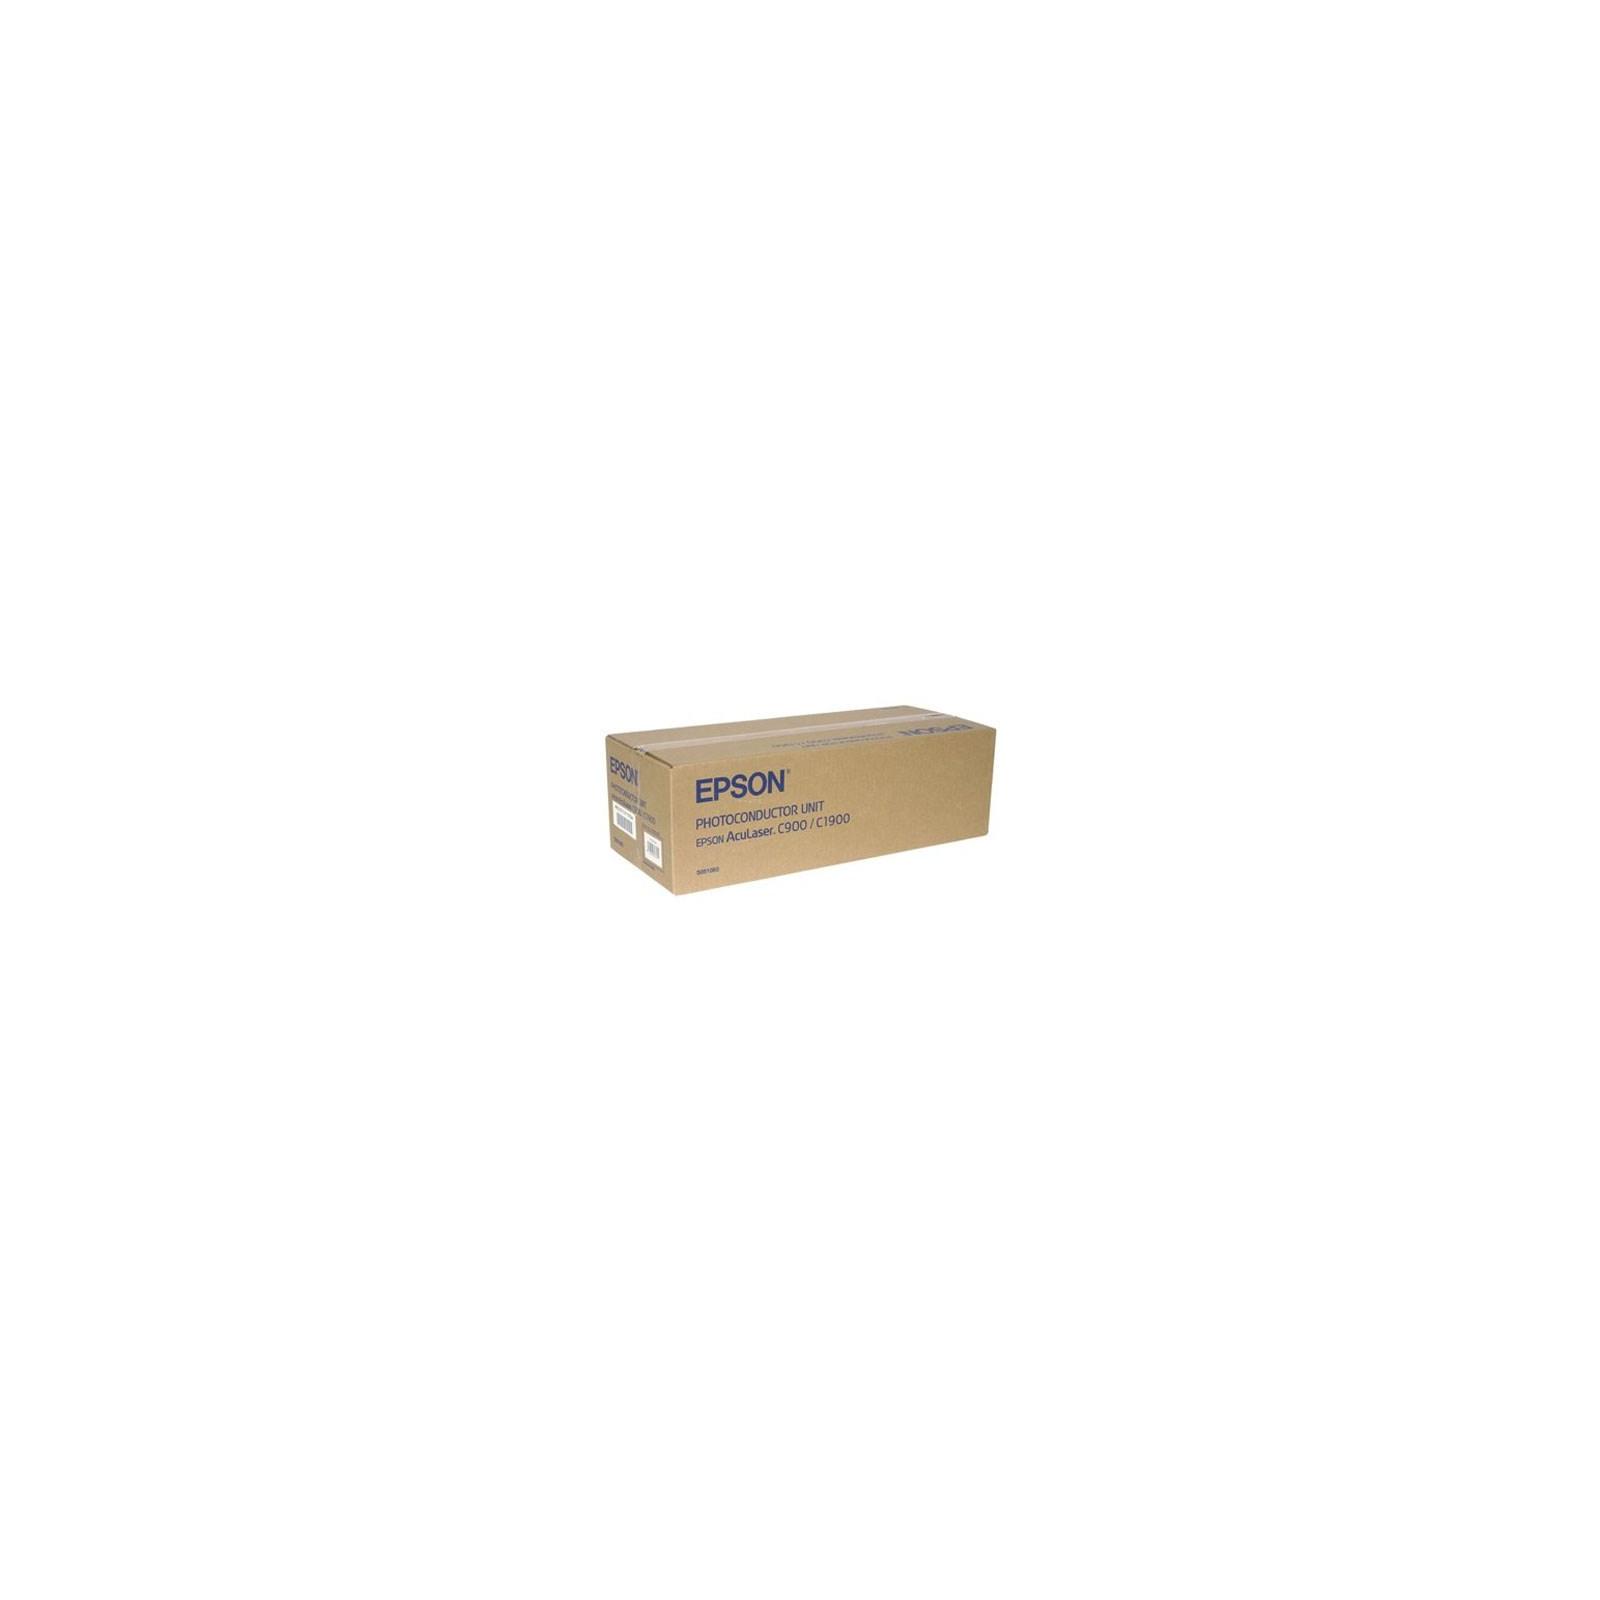 Фотокондуктор EPSON AcuLaser C900/ C1900 (45K/11.25K) (C13S051083)